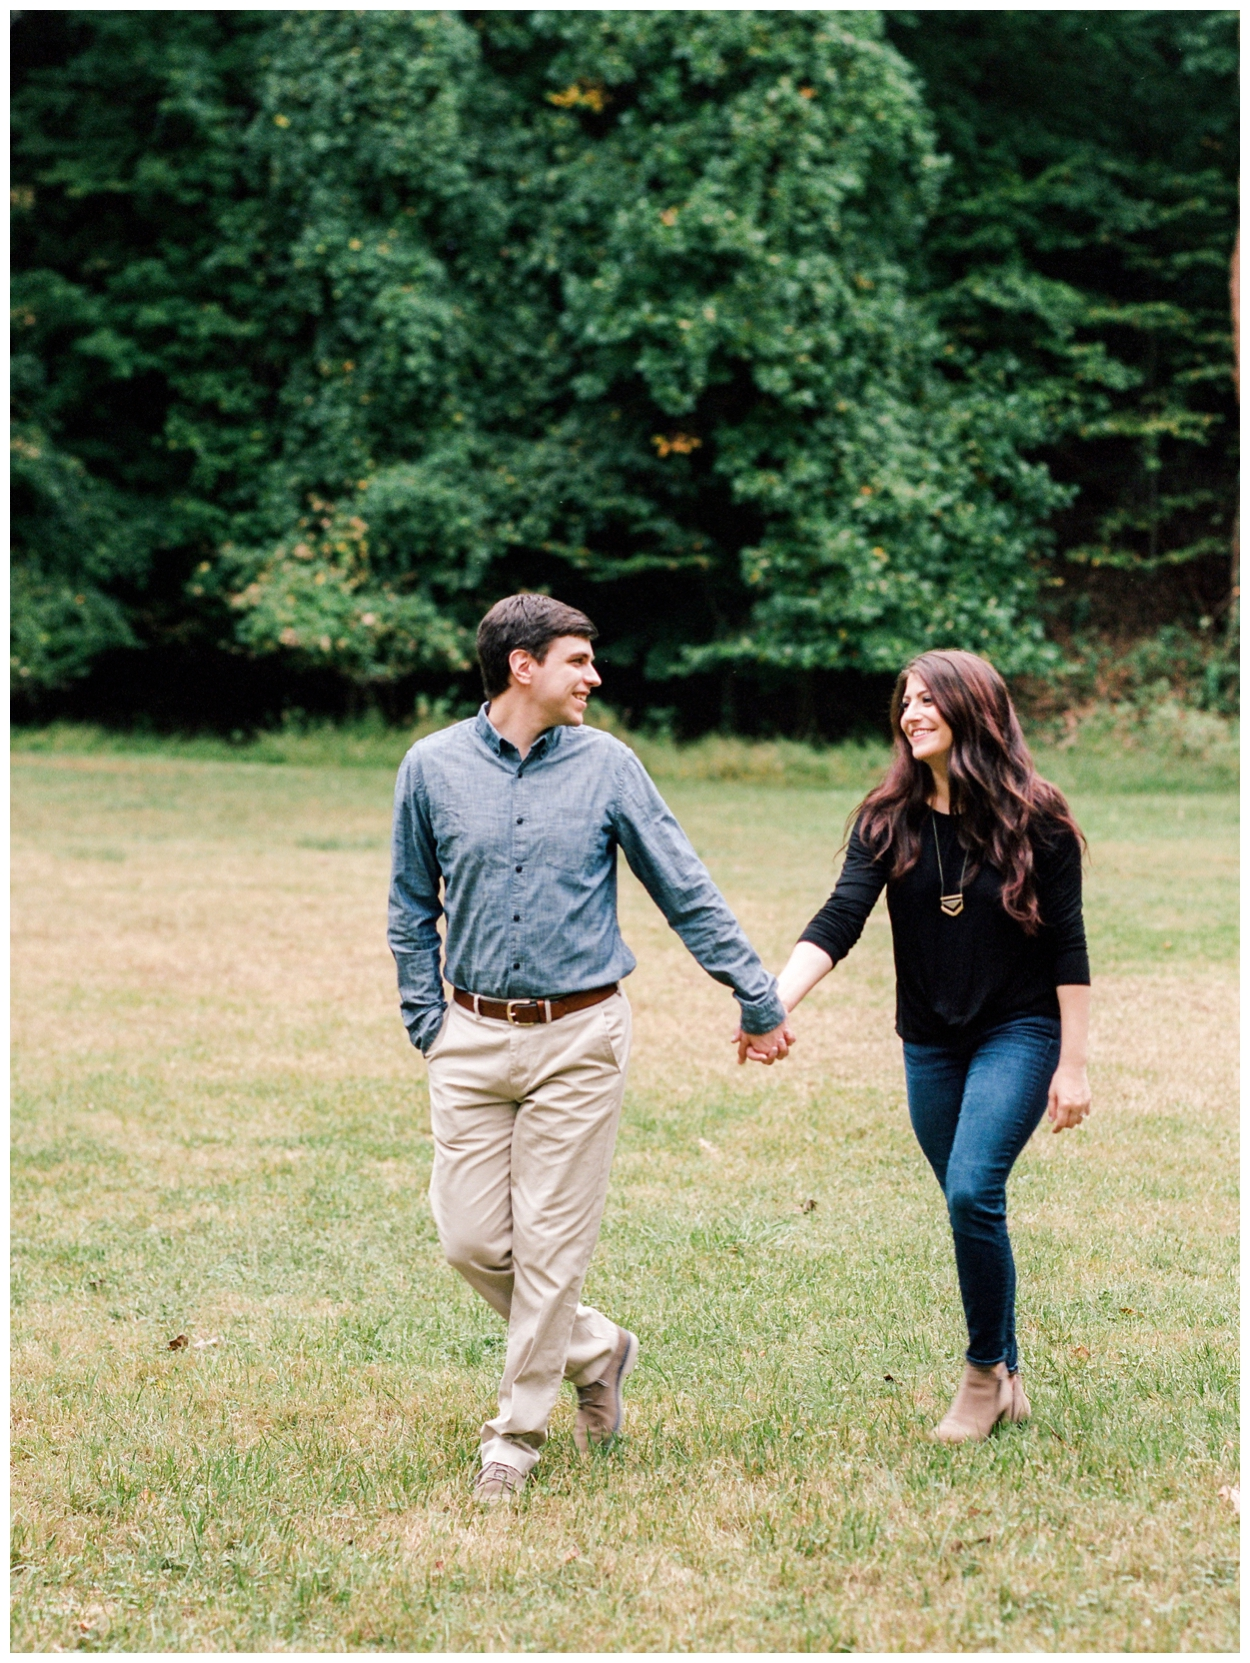 Rainy fall engagement session in Georgetown, Washington DC by fine art wedding photographer Lissa Ryan Photography